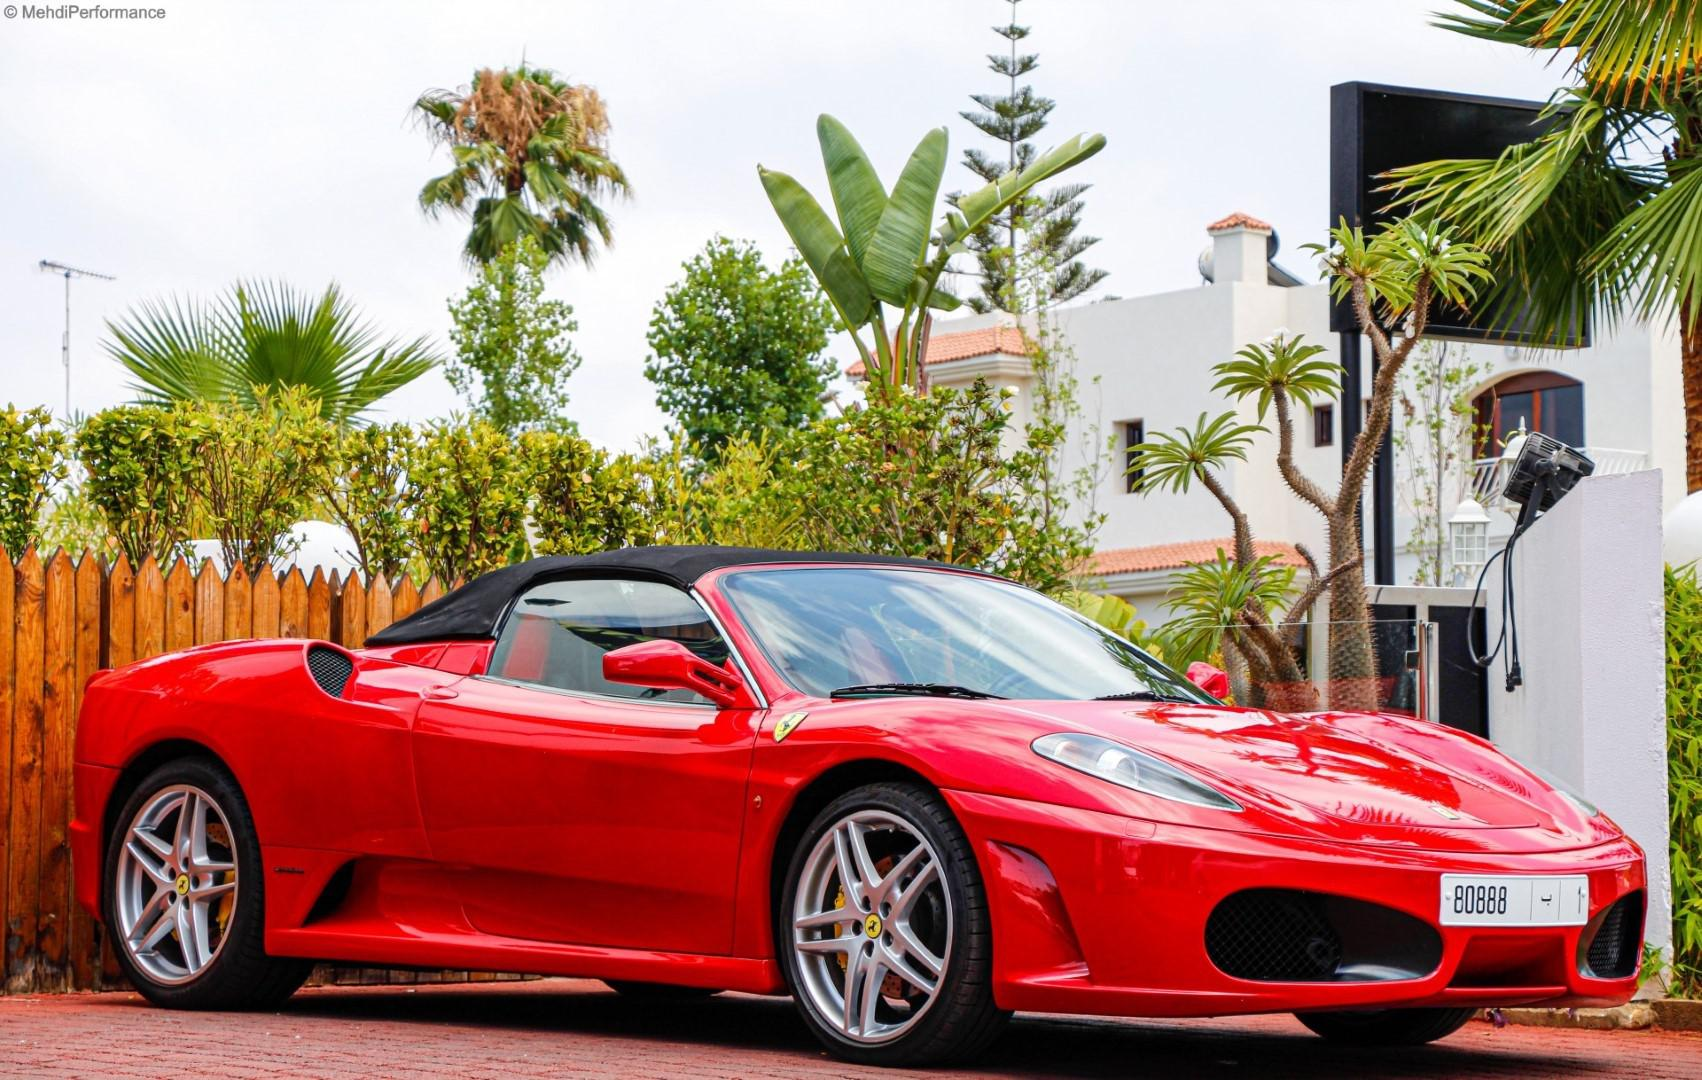 Rencontre d'une Ferrari F430 Spider